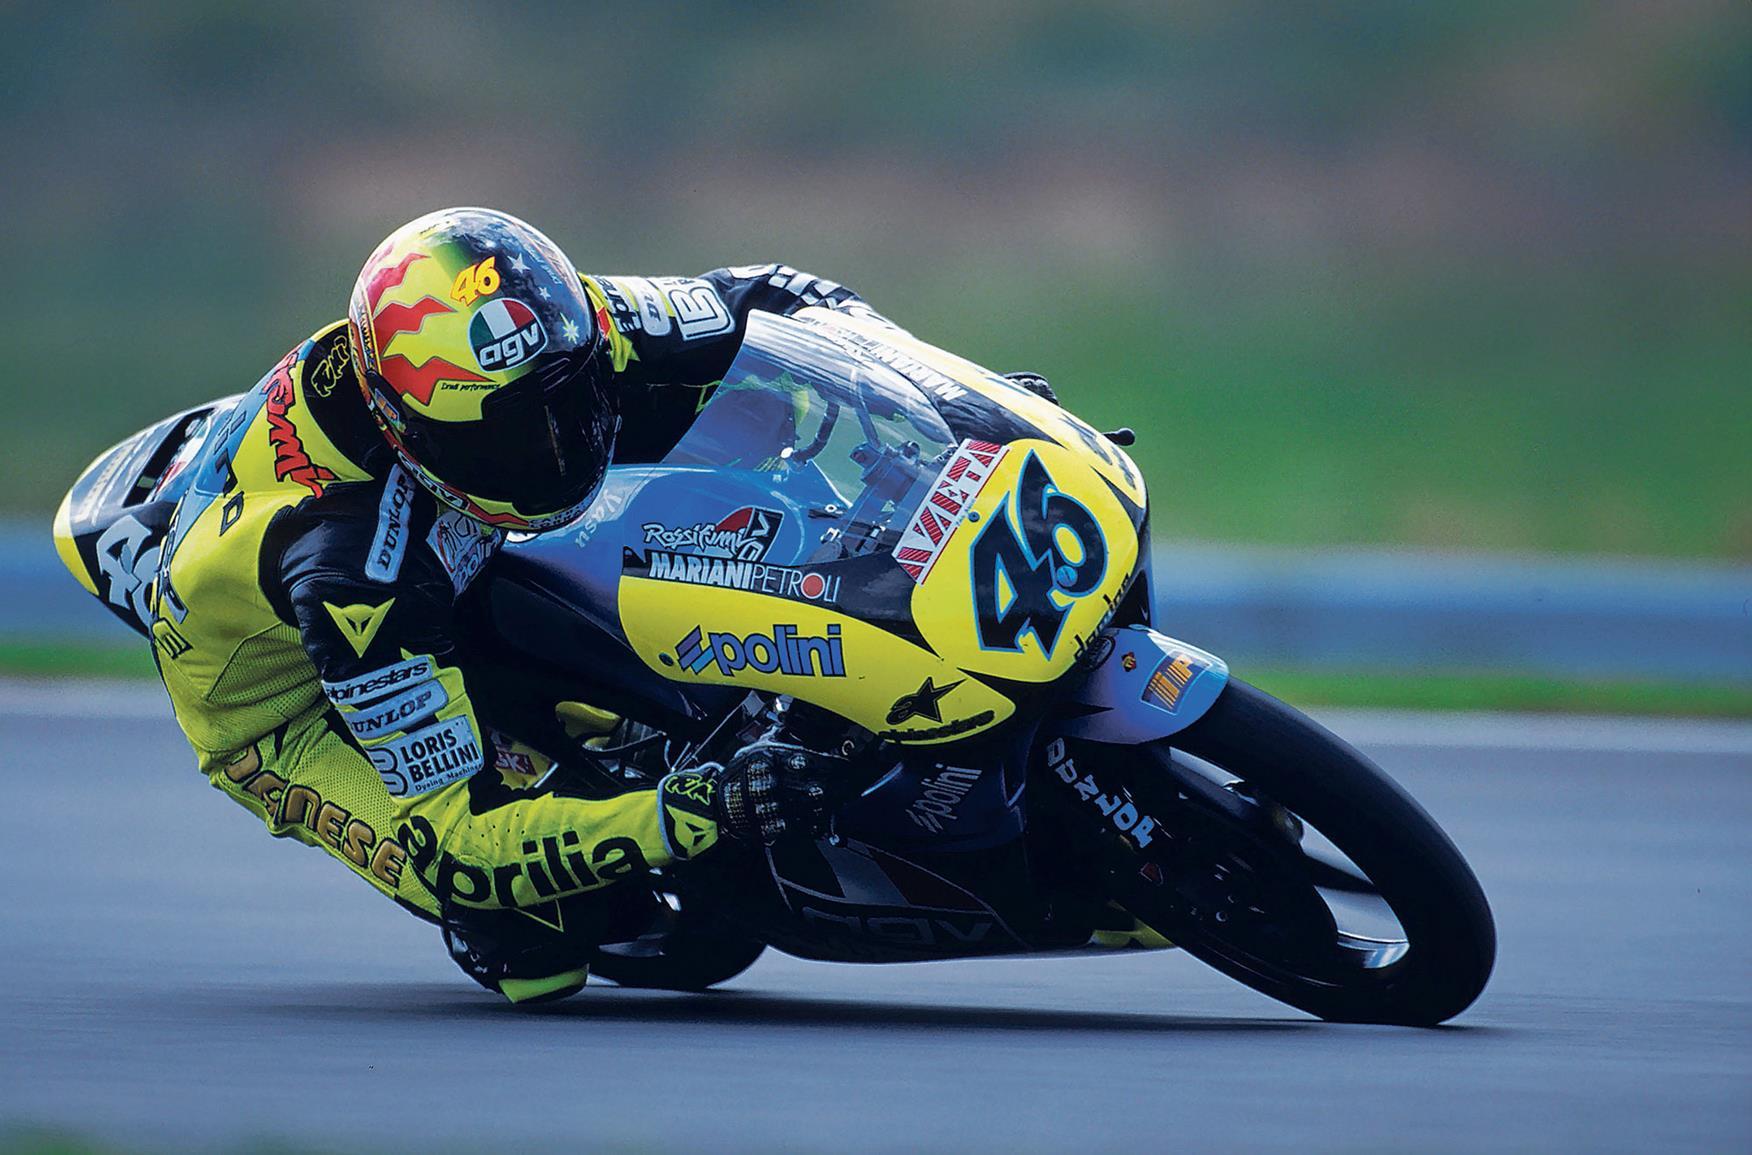 Valentino Rossi's first win in 1996